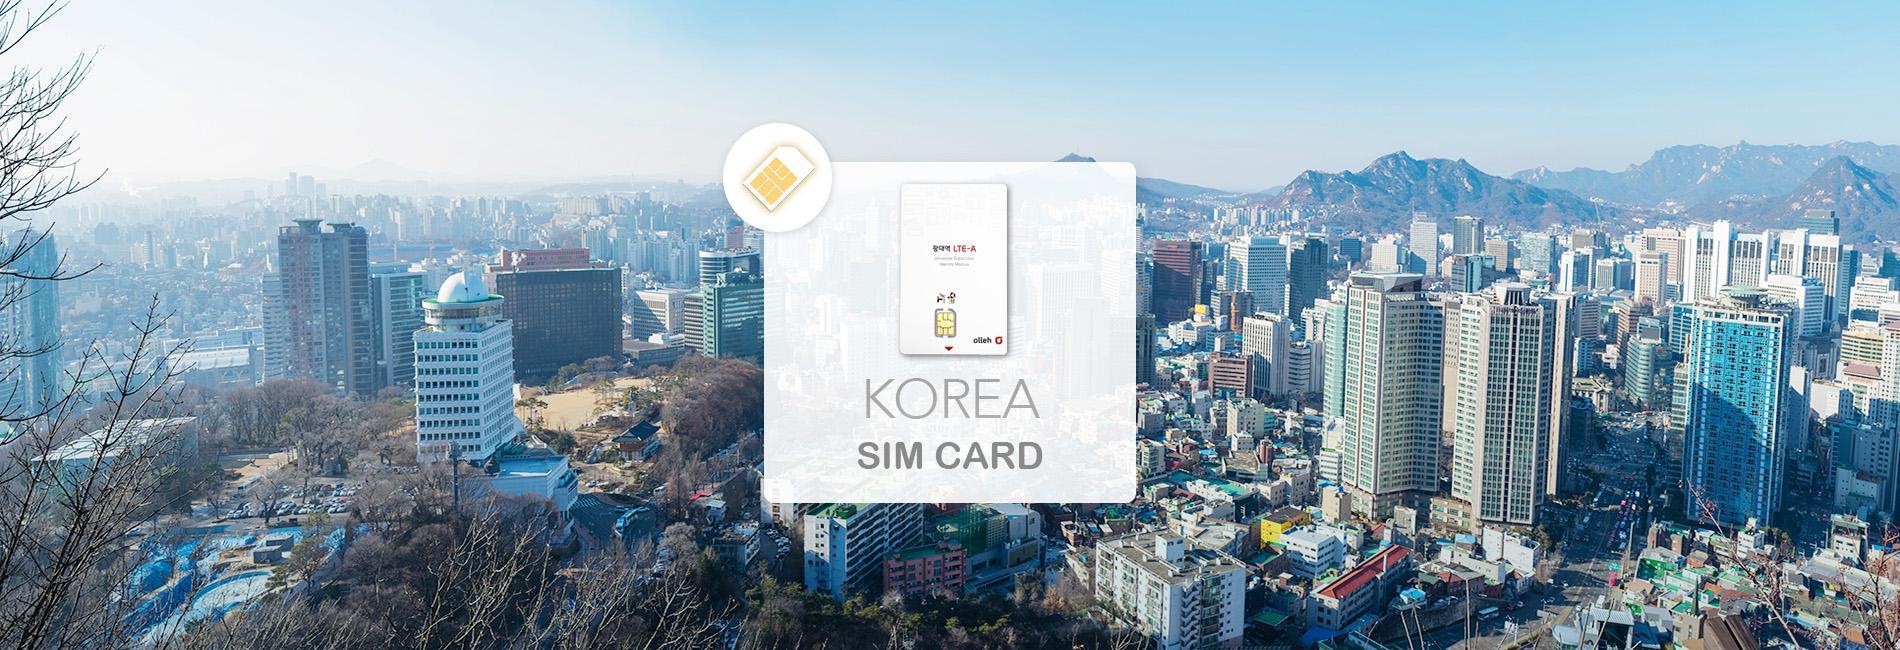 South Korea Unlimited 4G/LTE KT Olleh SIM Card (Pick-Up at Taiwan Taoyuan International Airport)